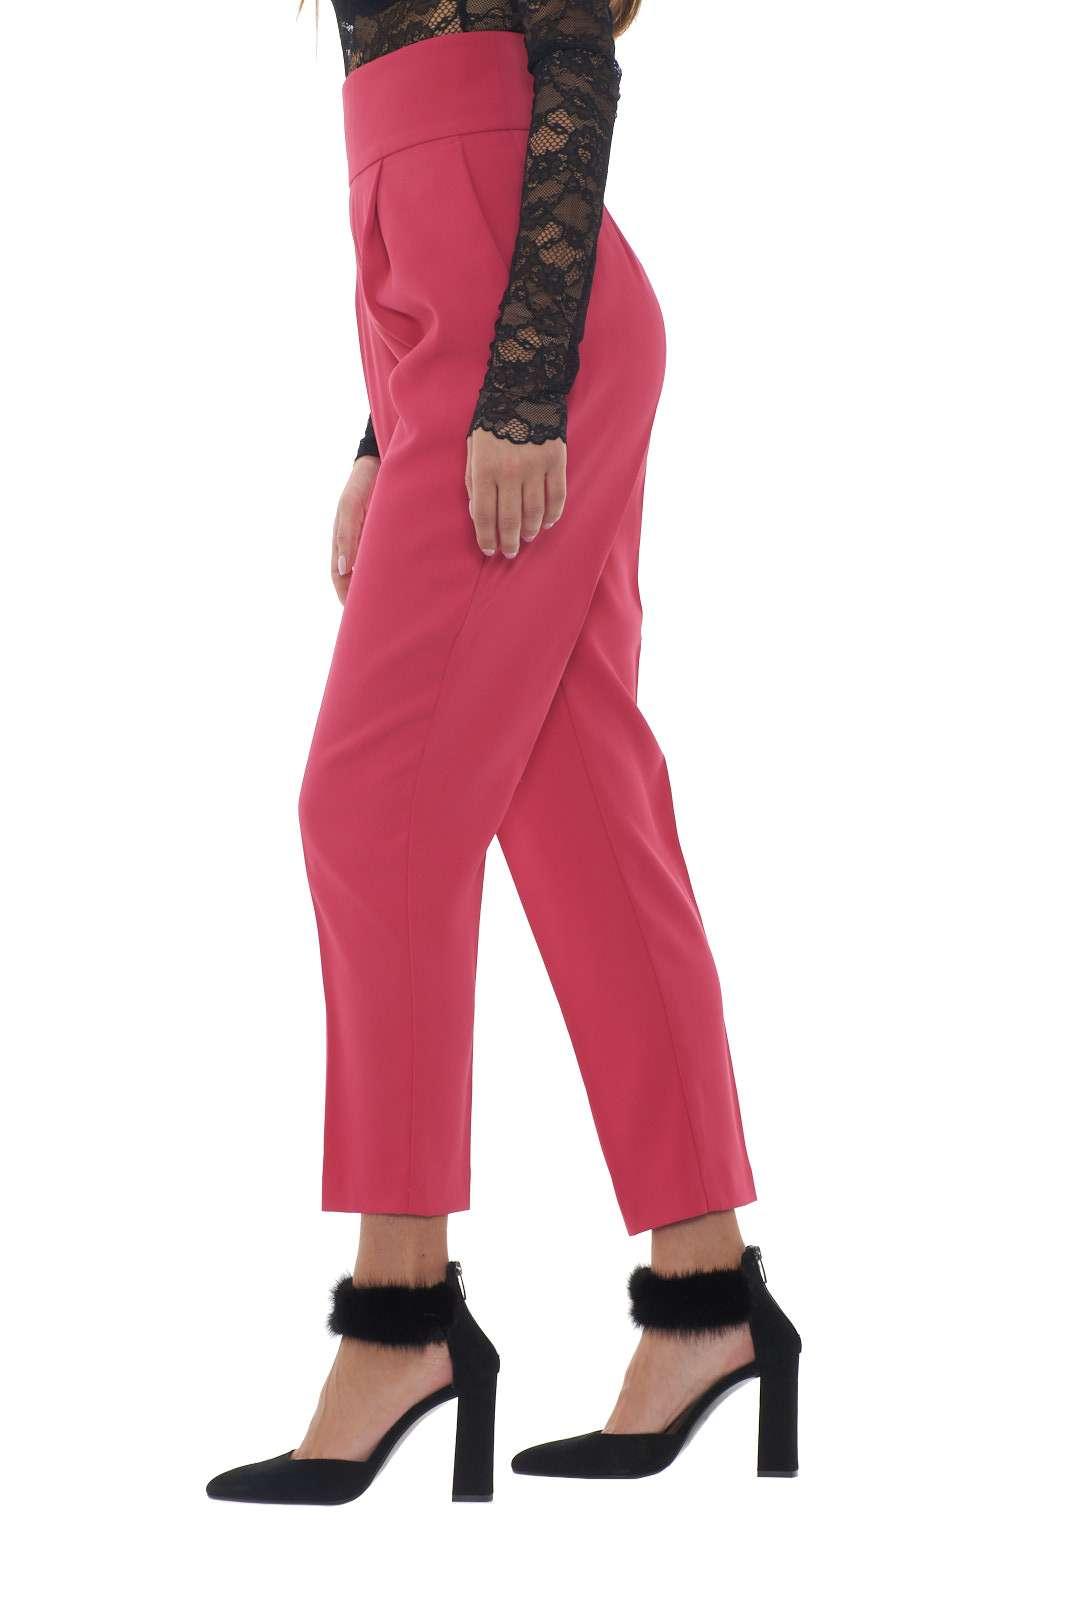 https://www.parmax.com/media/catalog/product/a/i/AI-outlet_parmax-pantaloni-donna-Pinko-1G14C7-B.jpg